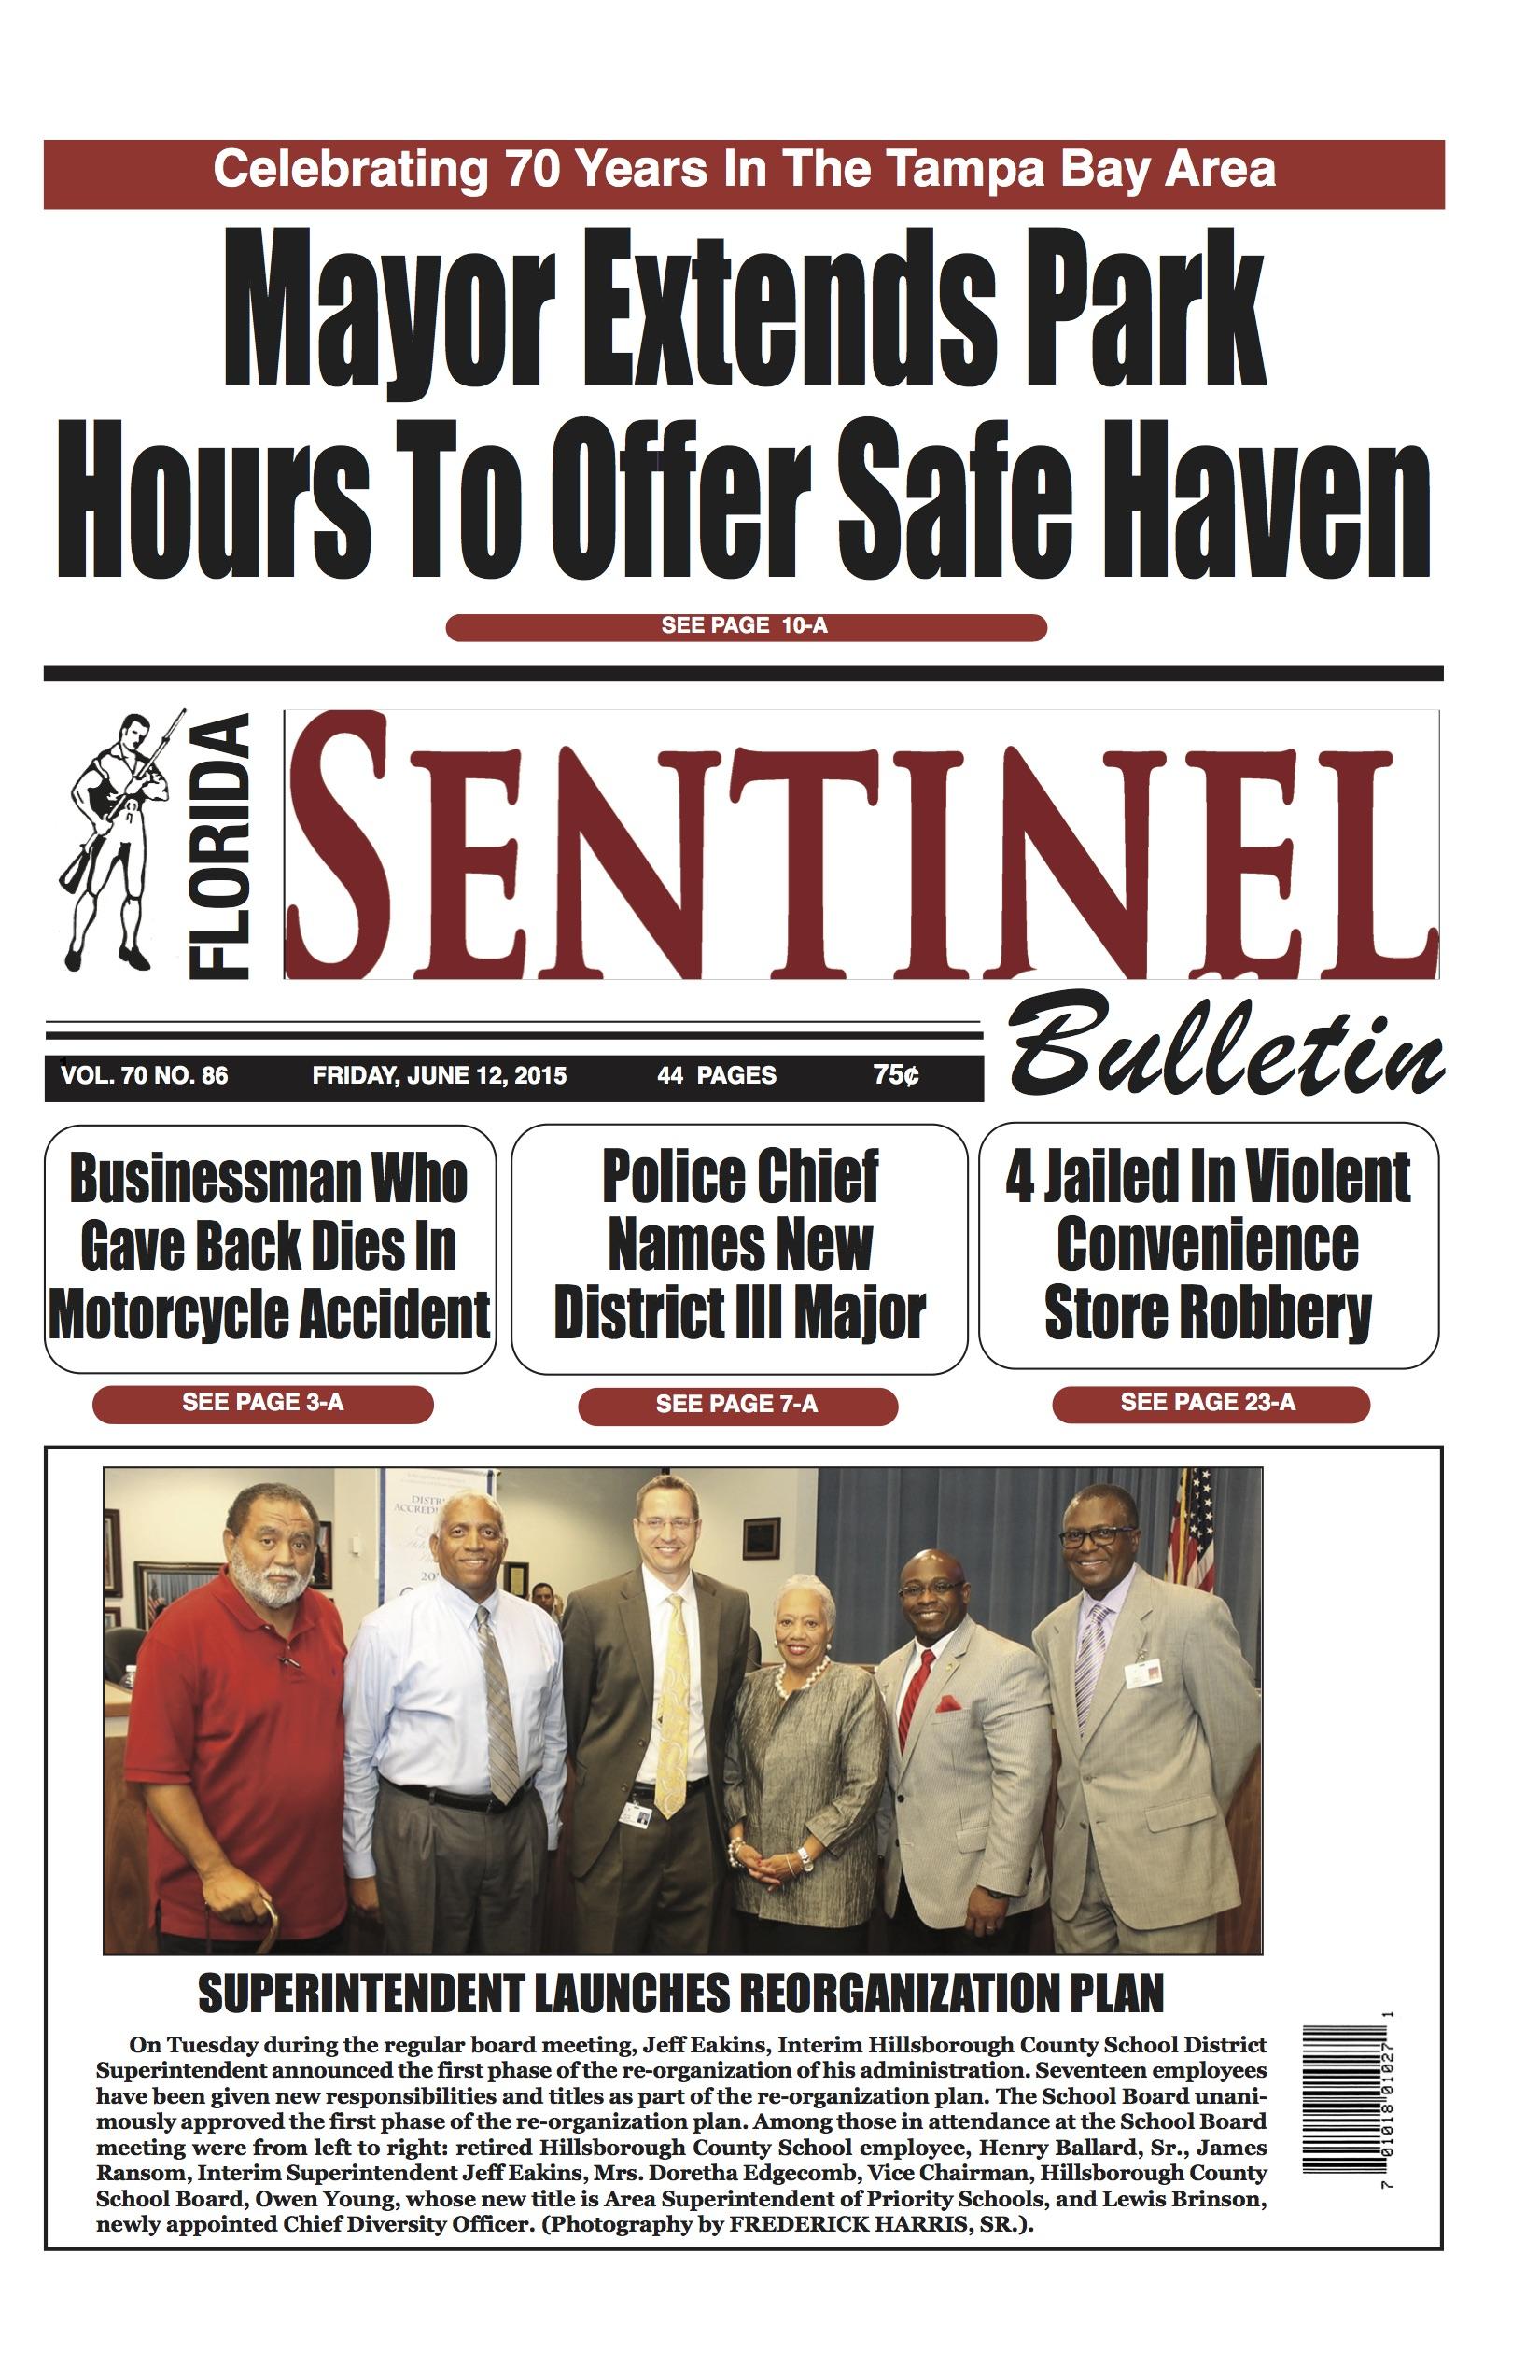 Florida Sentinel 6-12-15 Edition | Florida Sentinel Bulletin